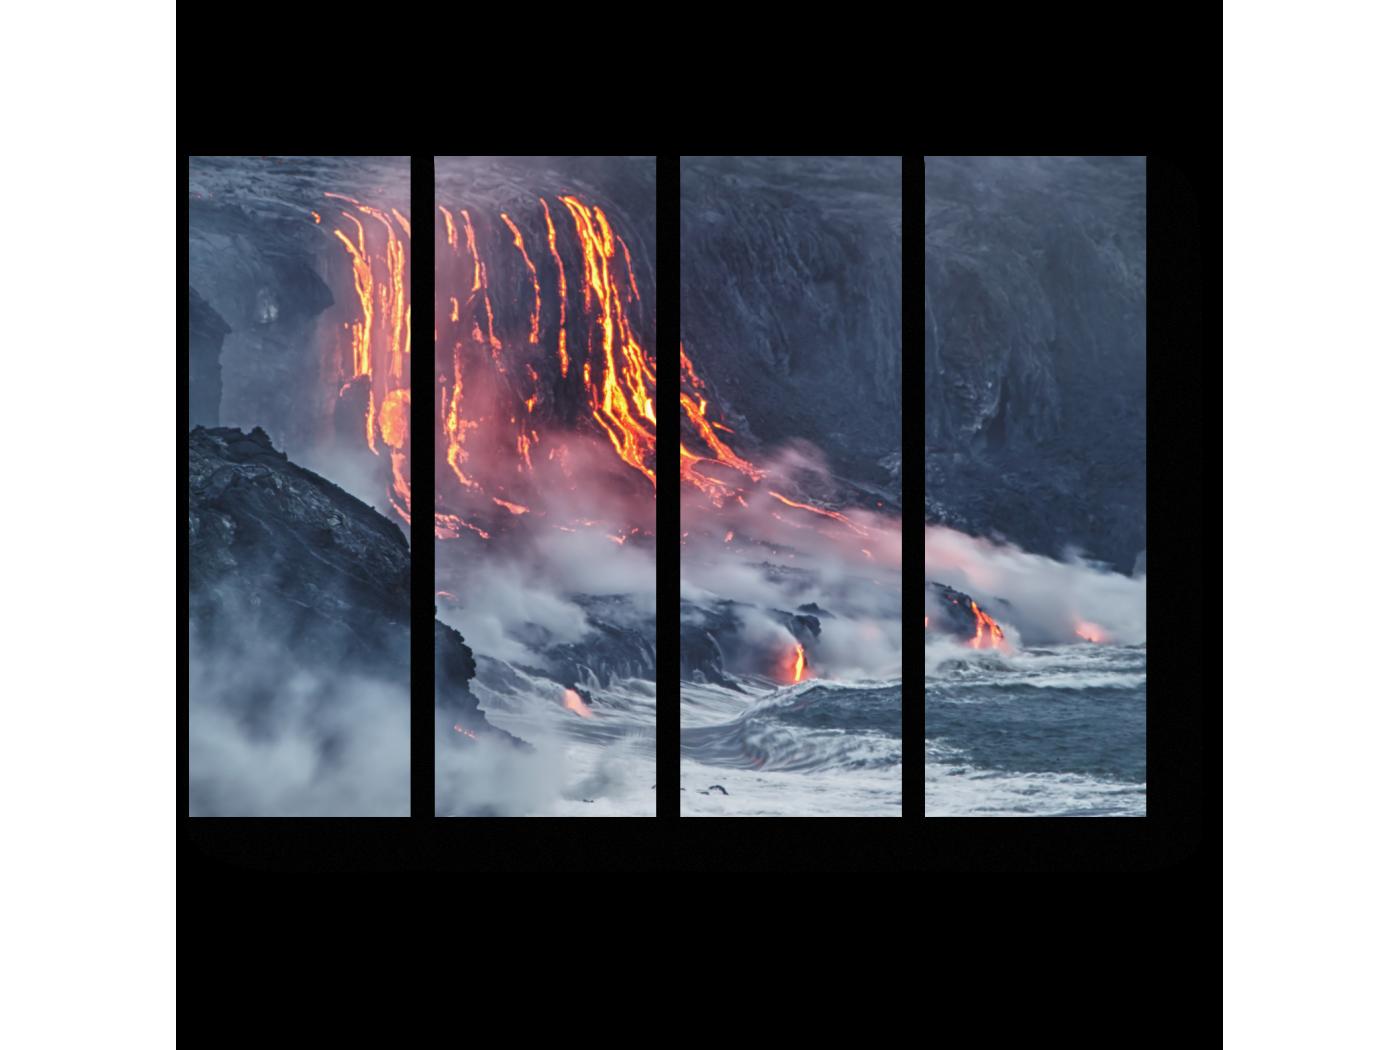 Модульная картина Гавайский вулкан (60x45) фото